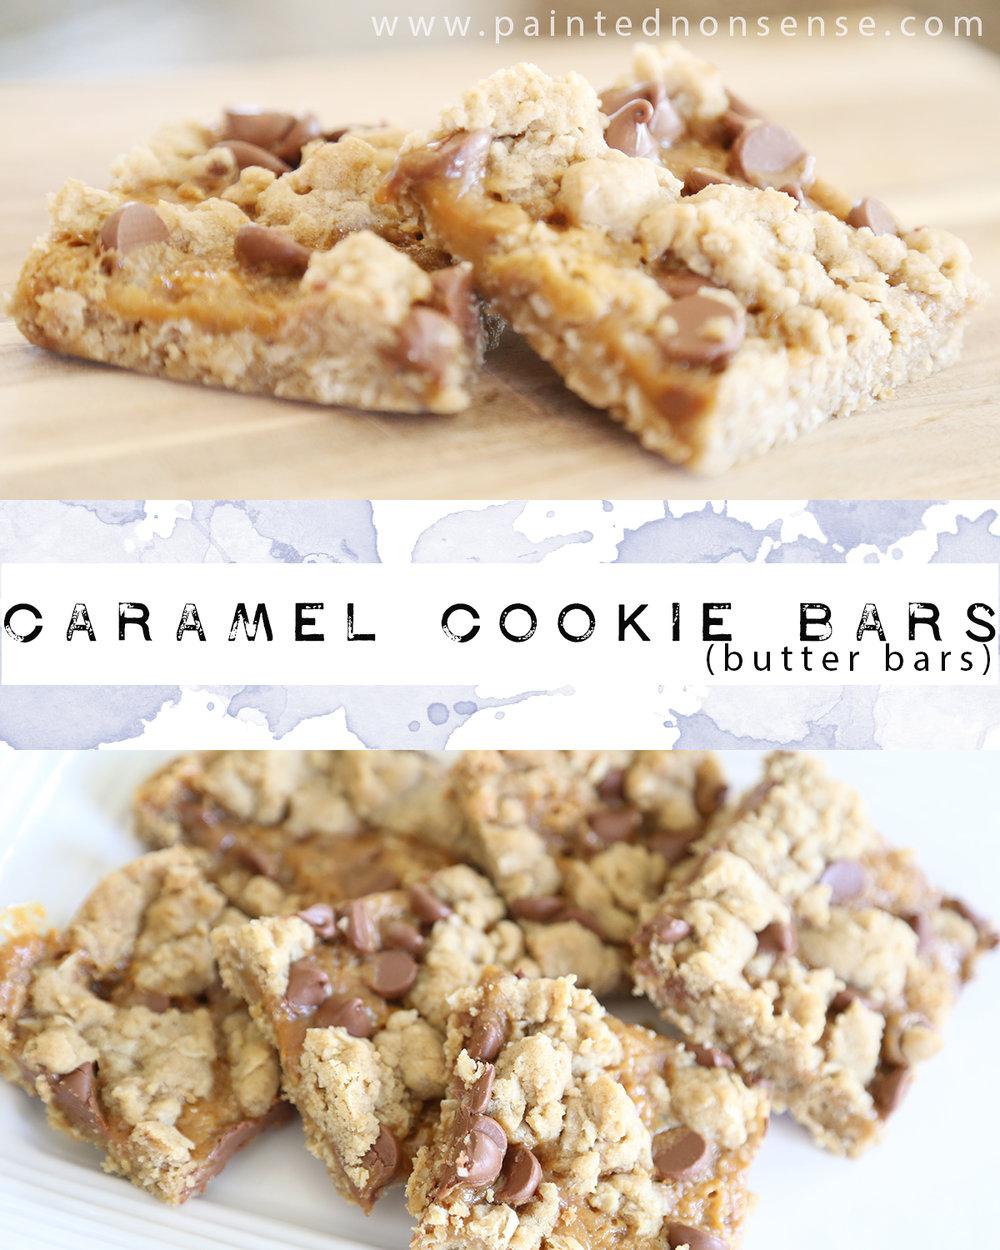 caramelcookiebars.jpg